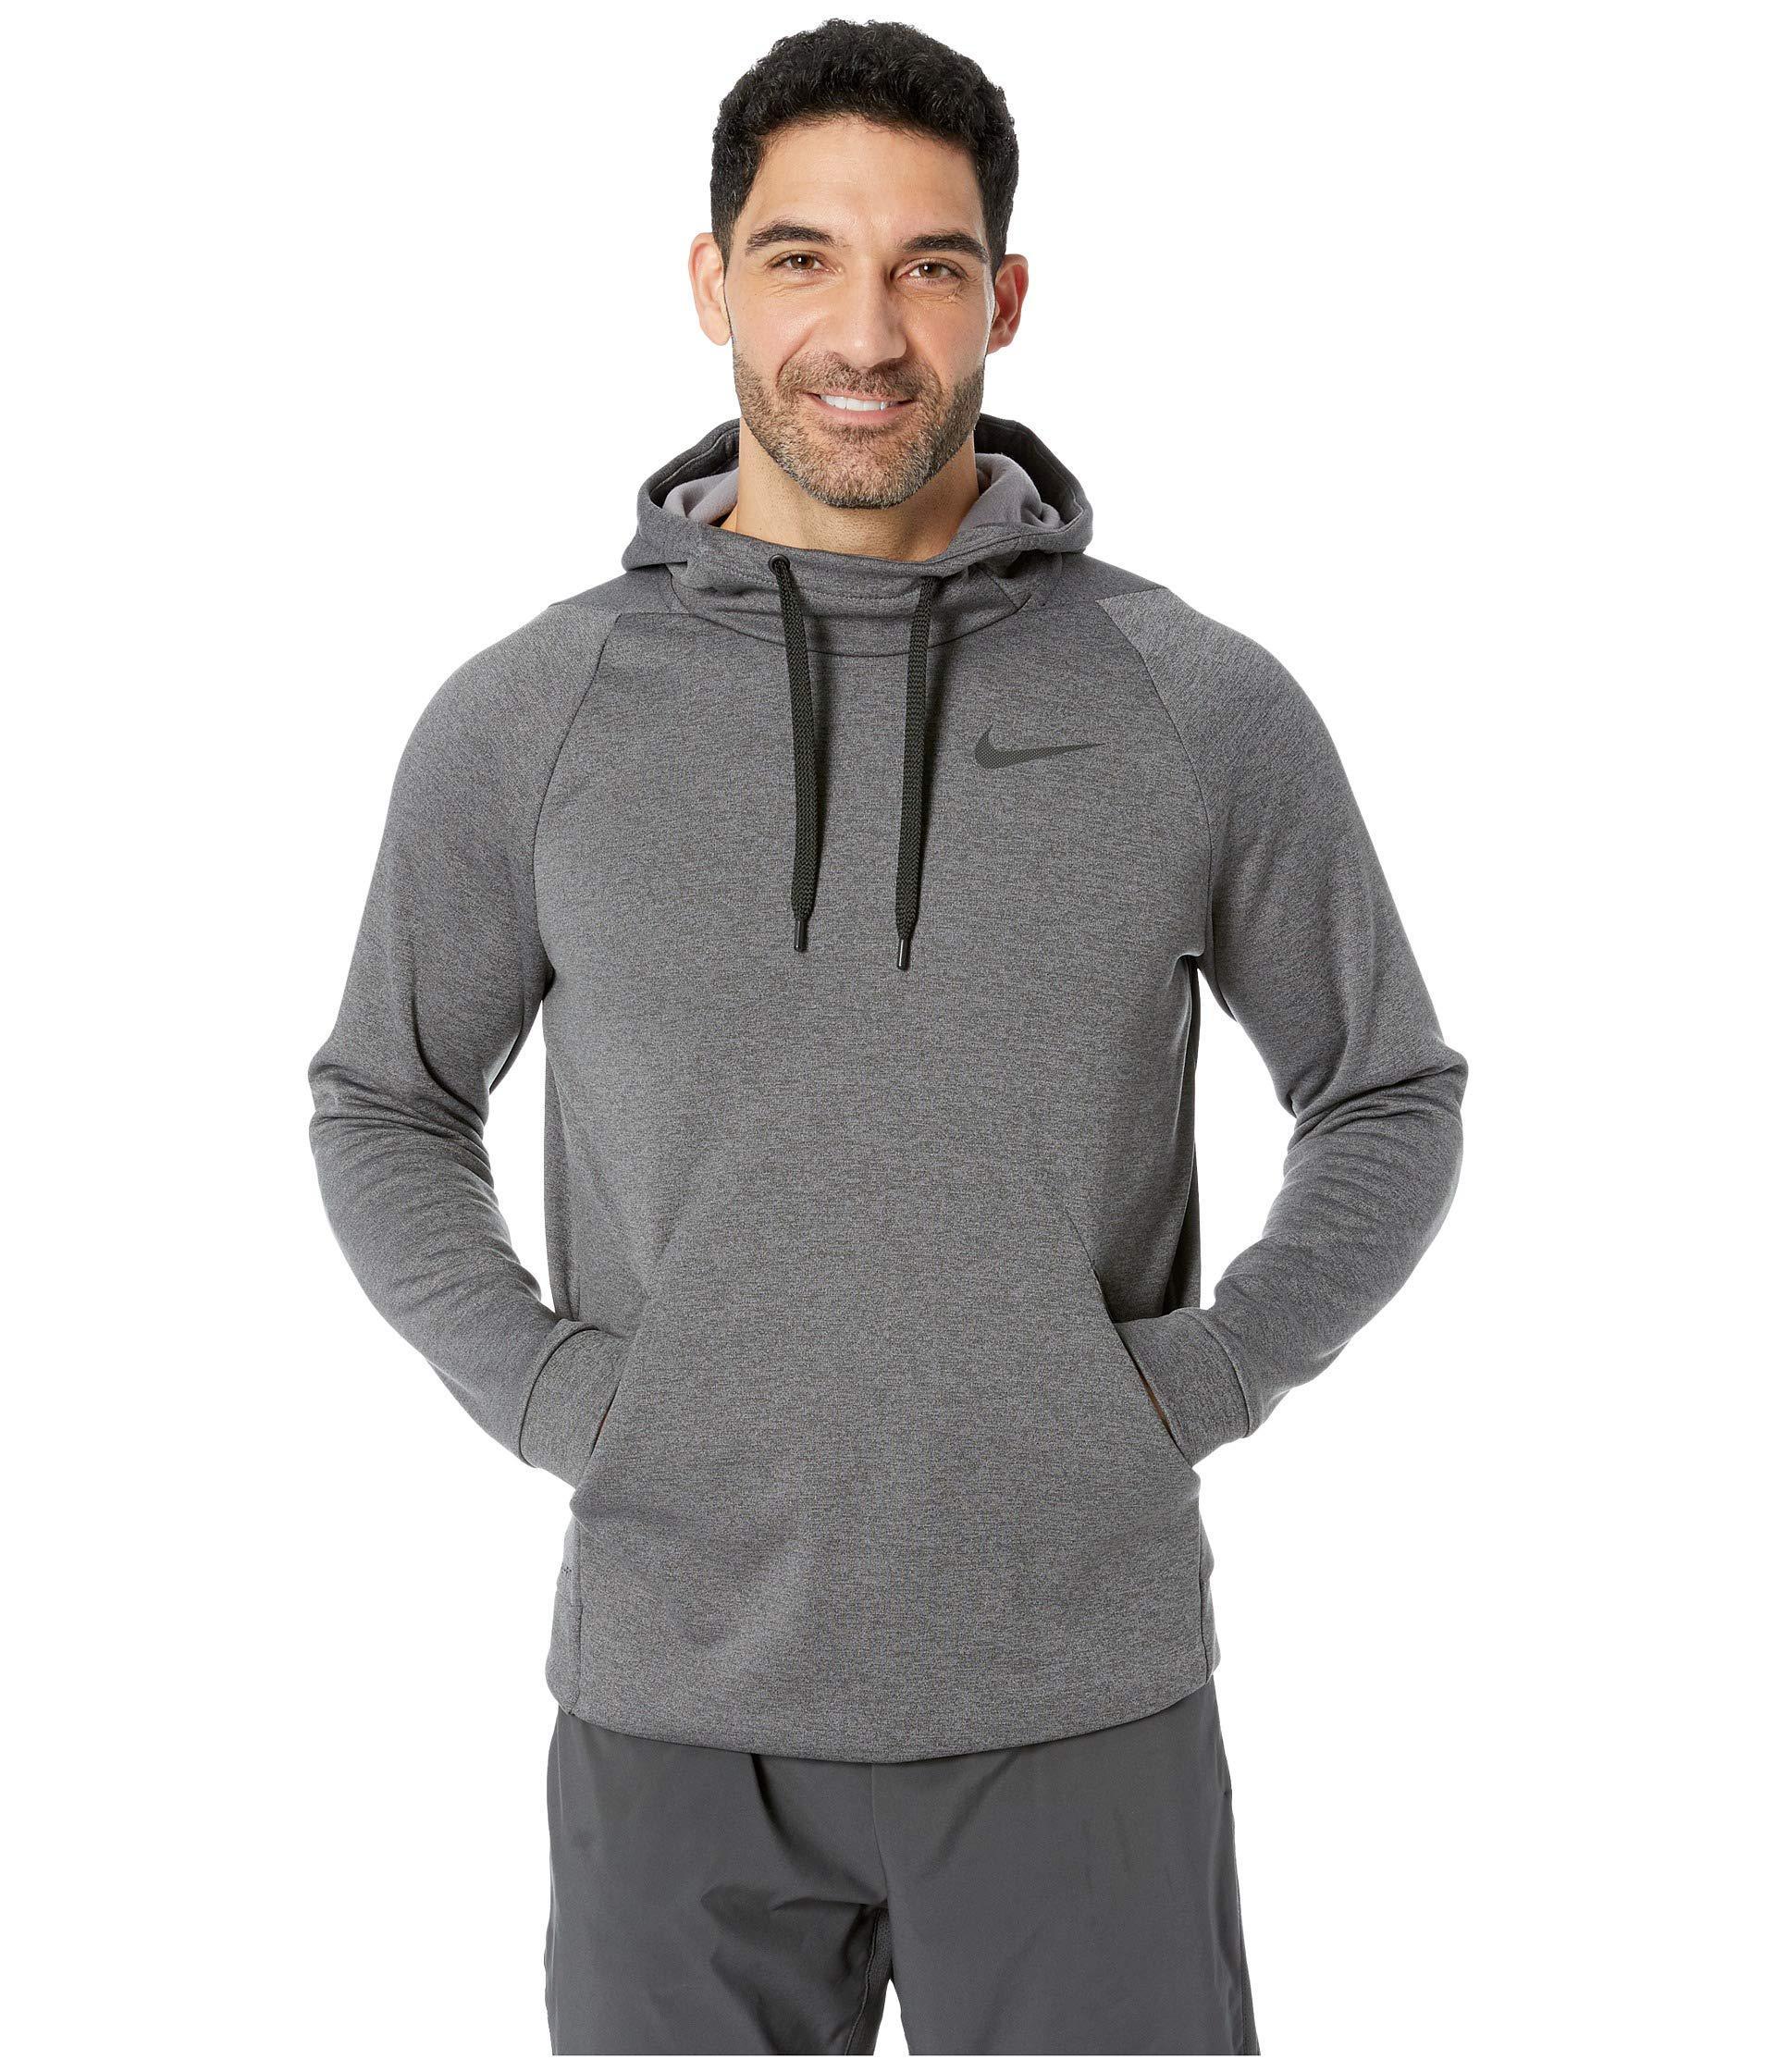 a5c48ab6b517 Nike. Gray Thermal Hoodie Pullover (charcoal Heather black) Men s Sweatshirt